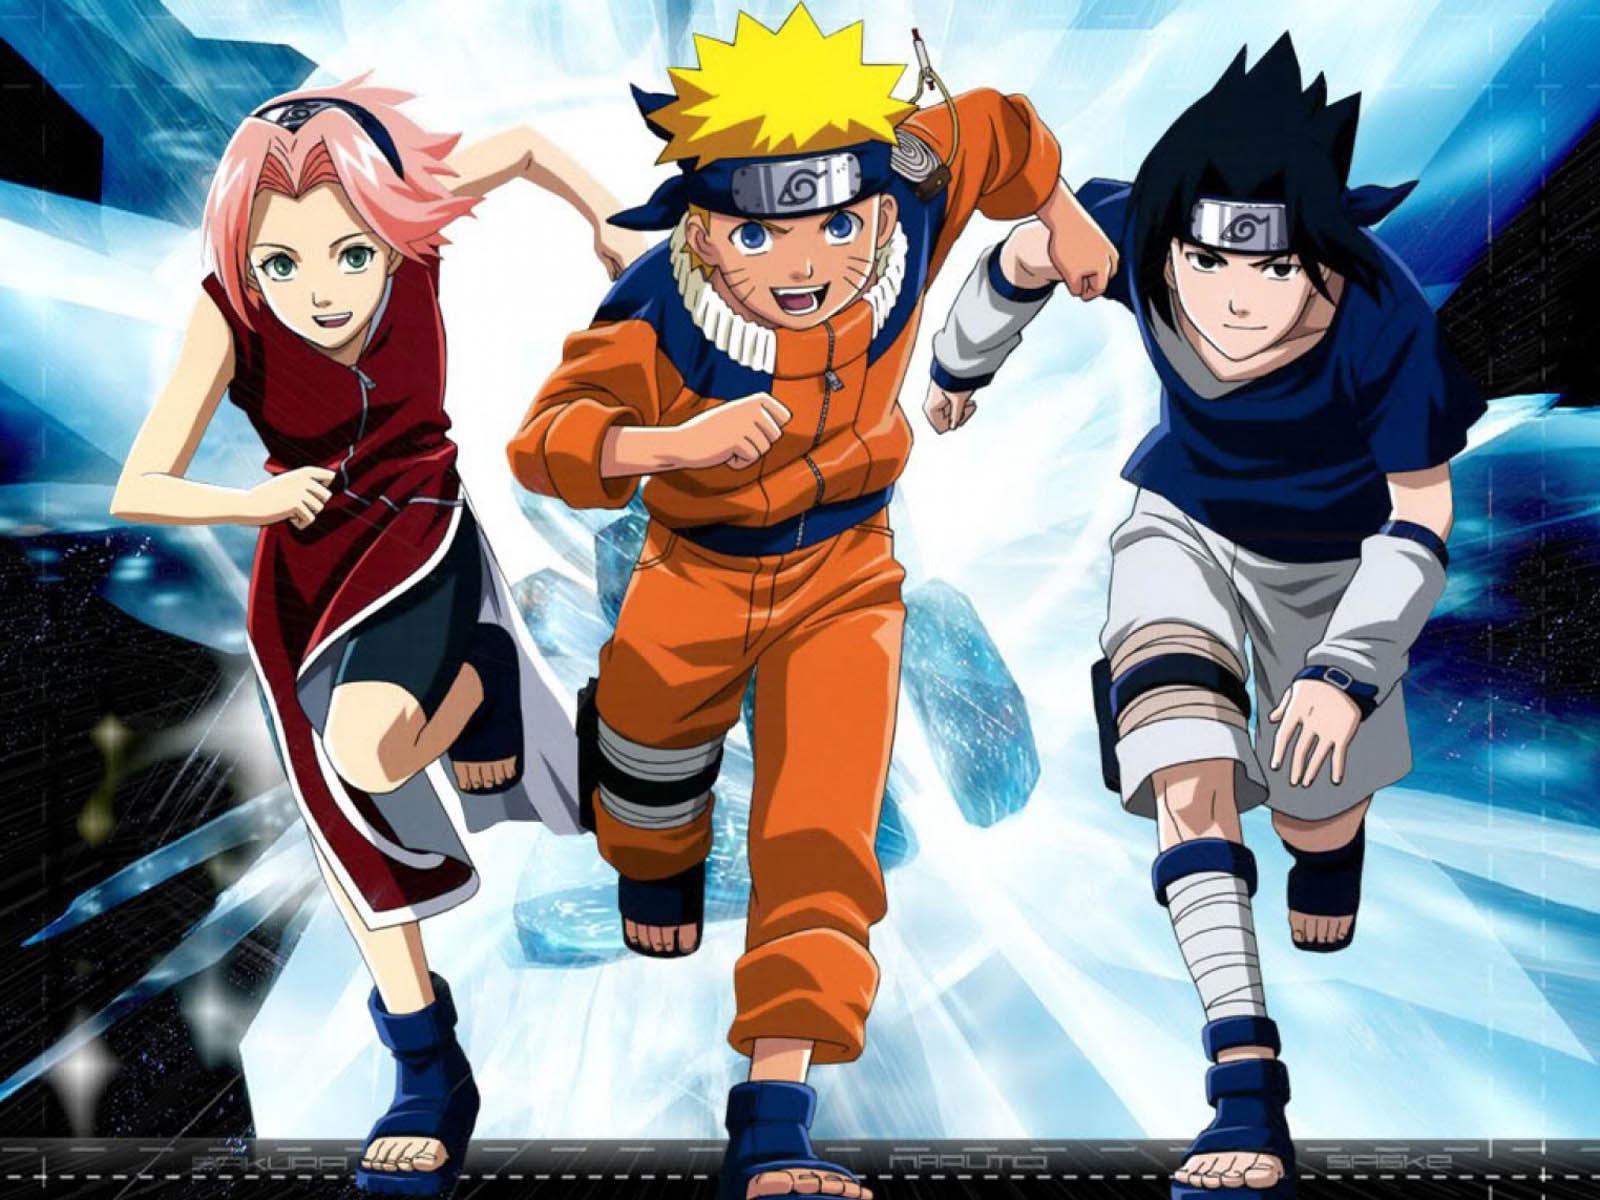 40 Koleksi Gambar Animasi Bergerak Kartun Naruto Terbaik